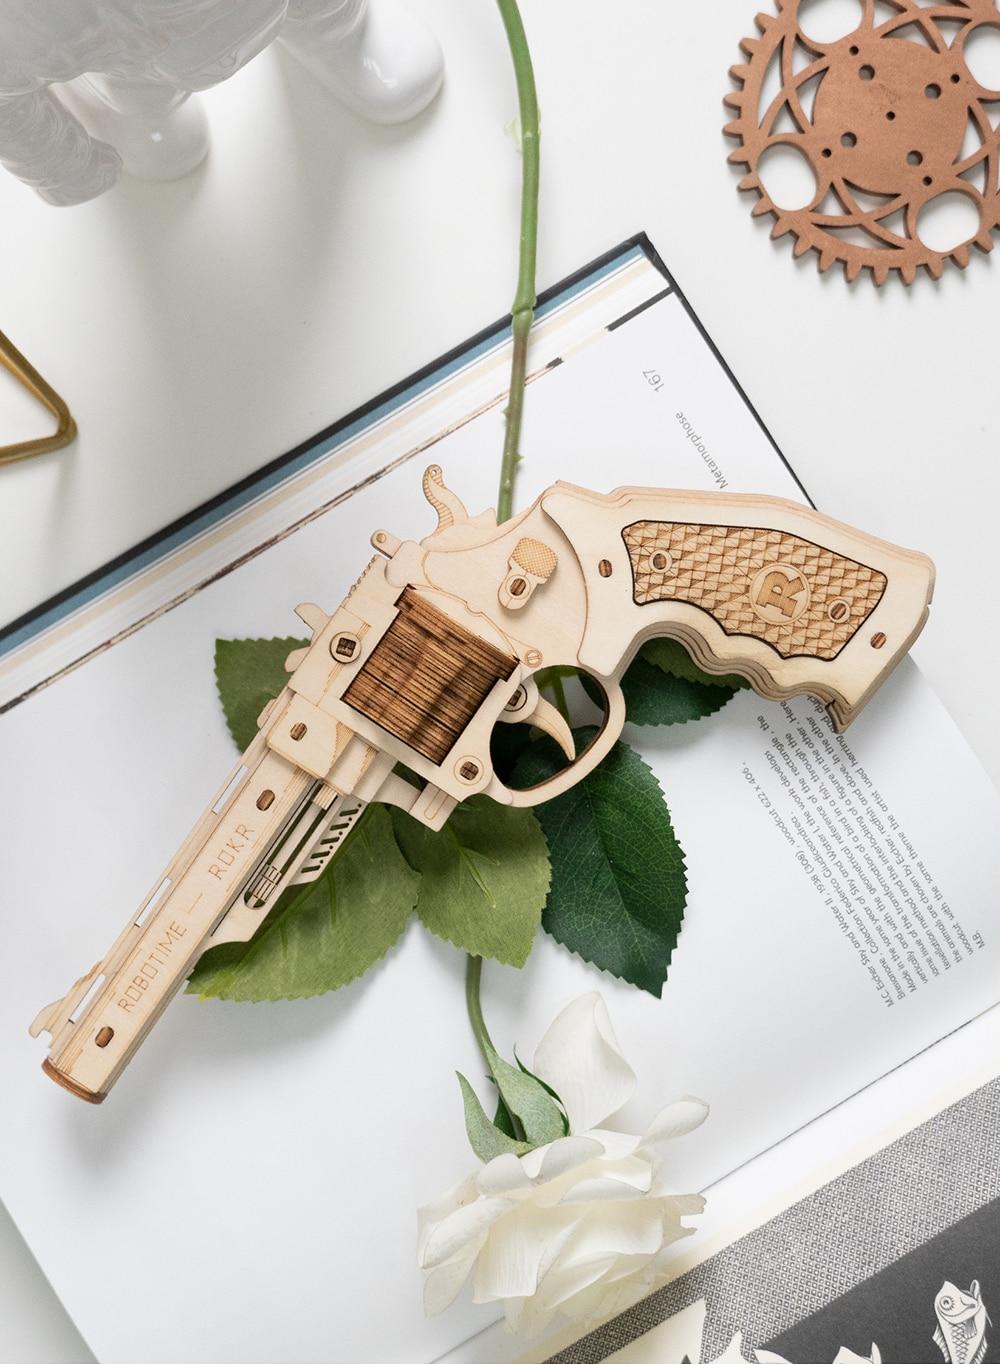 Robotime LQ401 Corsac M60 - Justice Guard Gun Toys